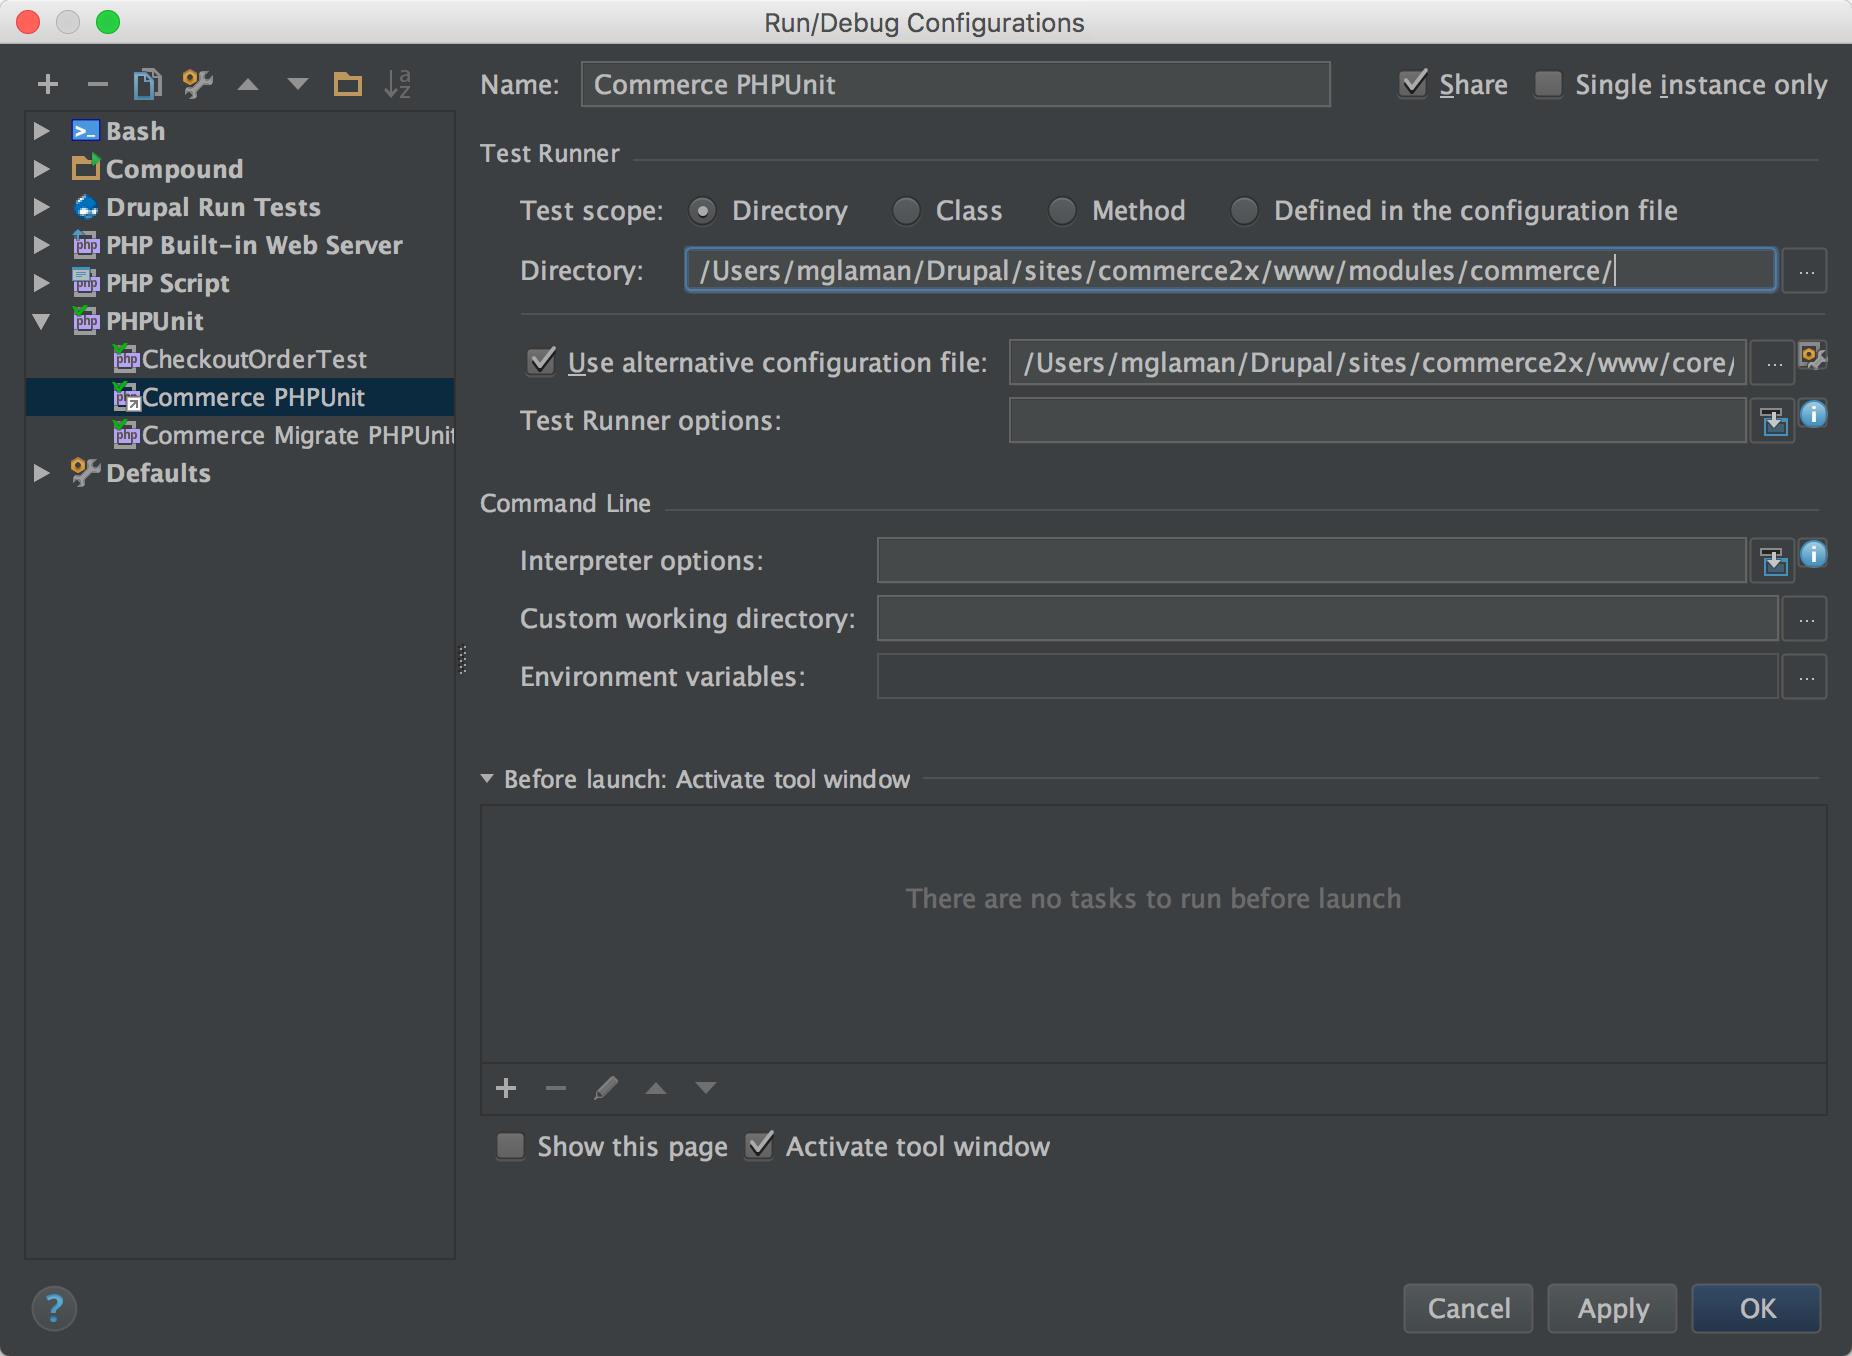 PHPUnit run configuration